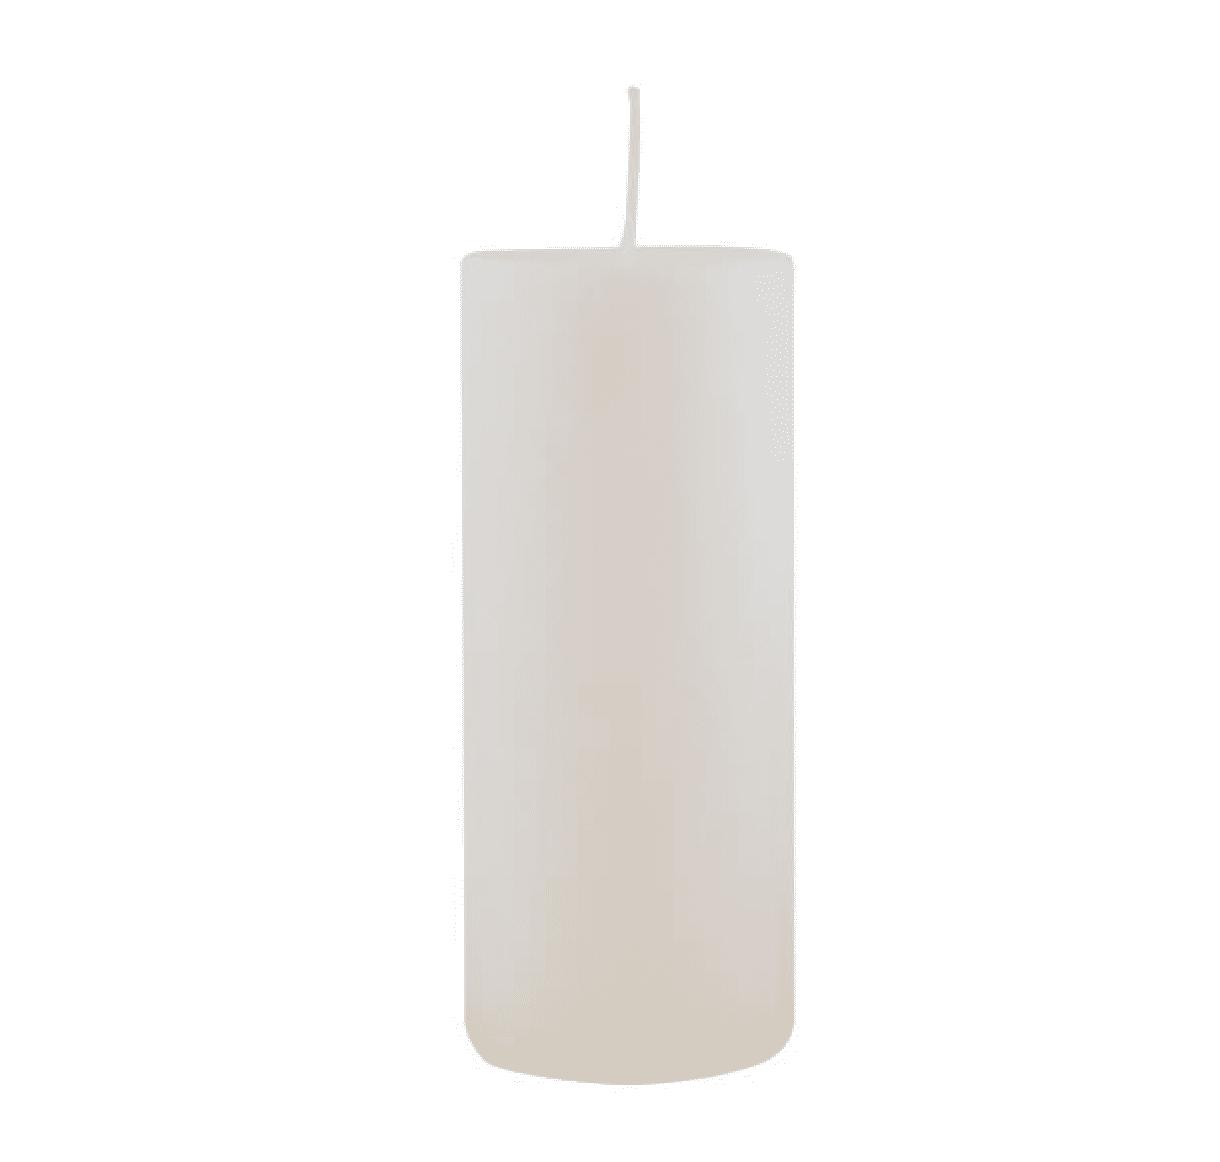 Candela pilastro grande – Bianco